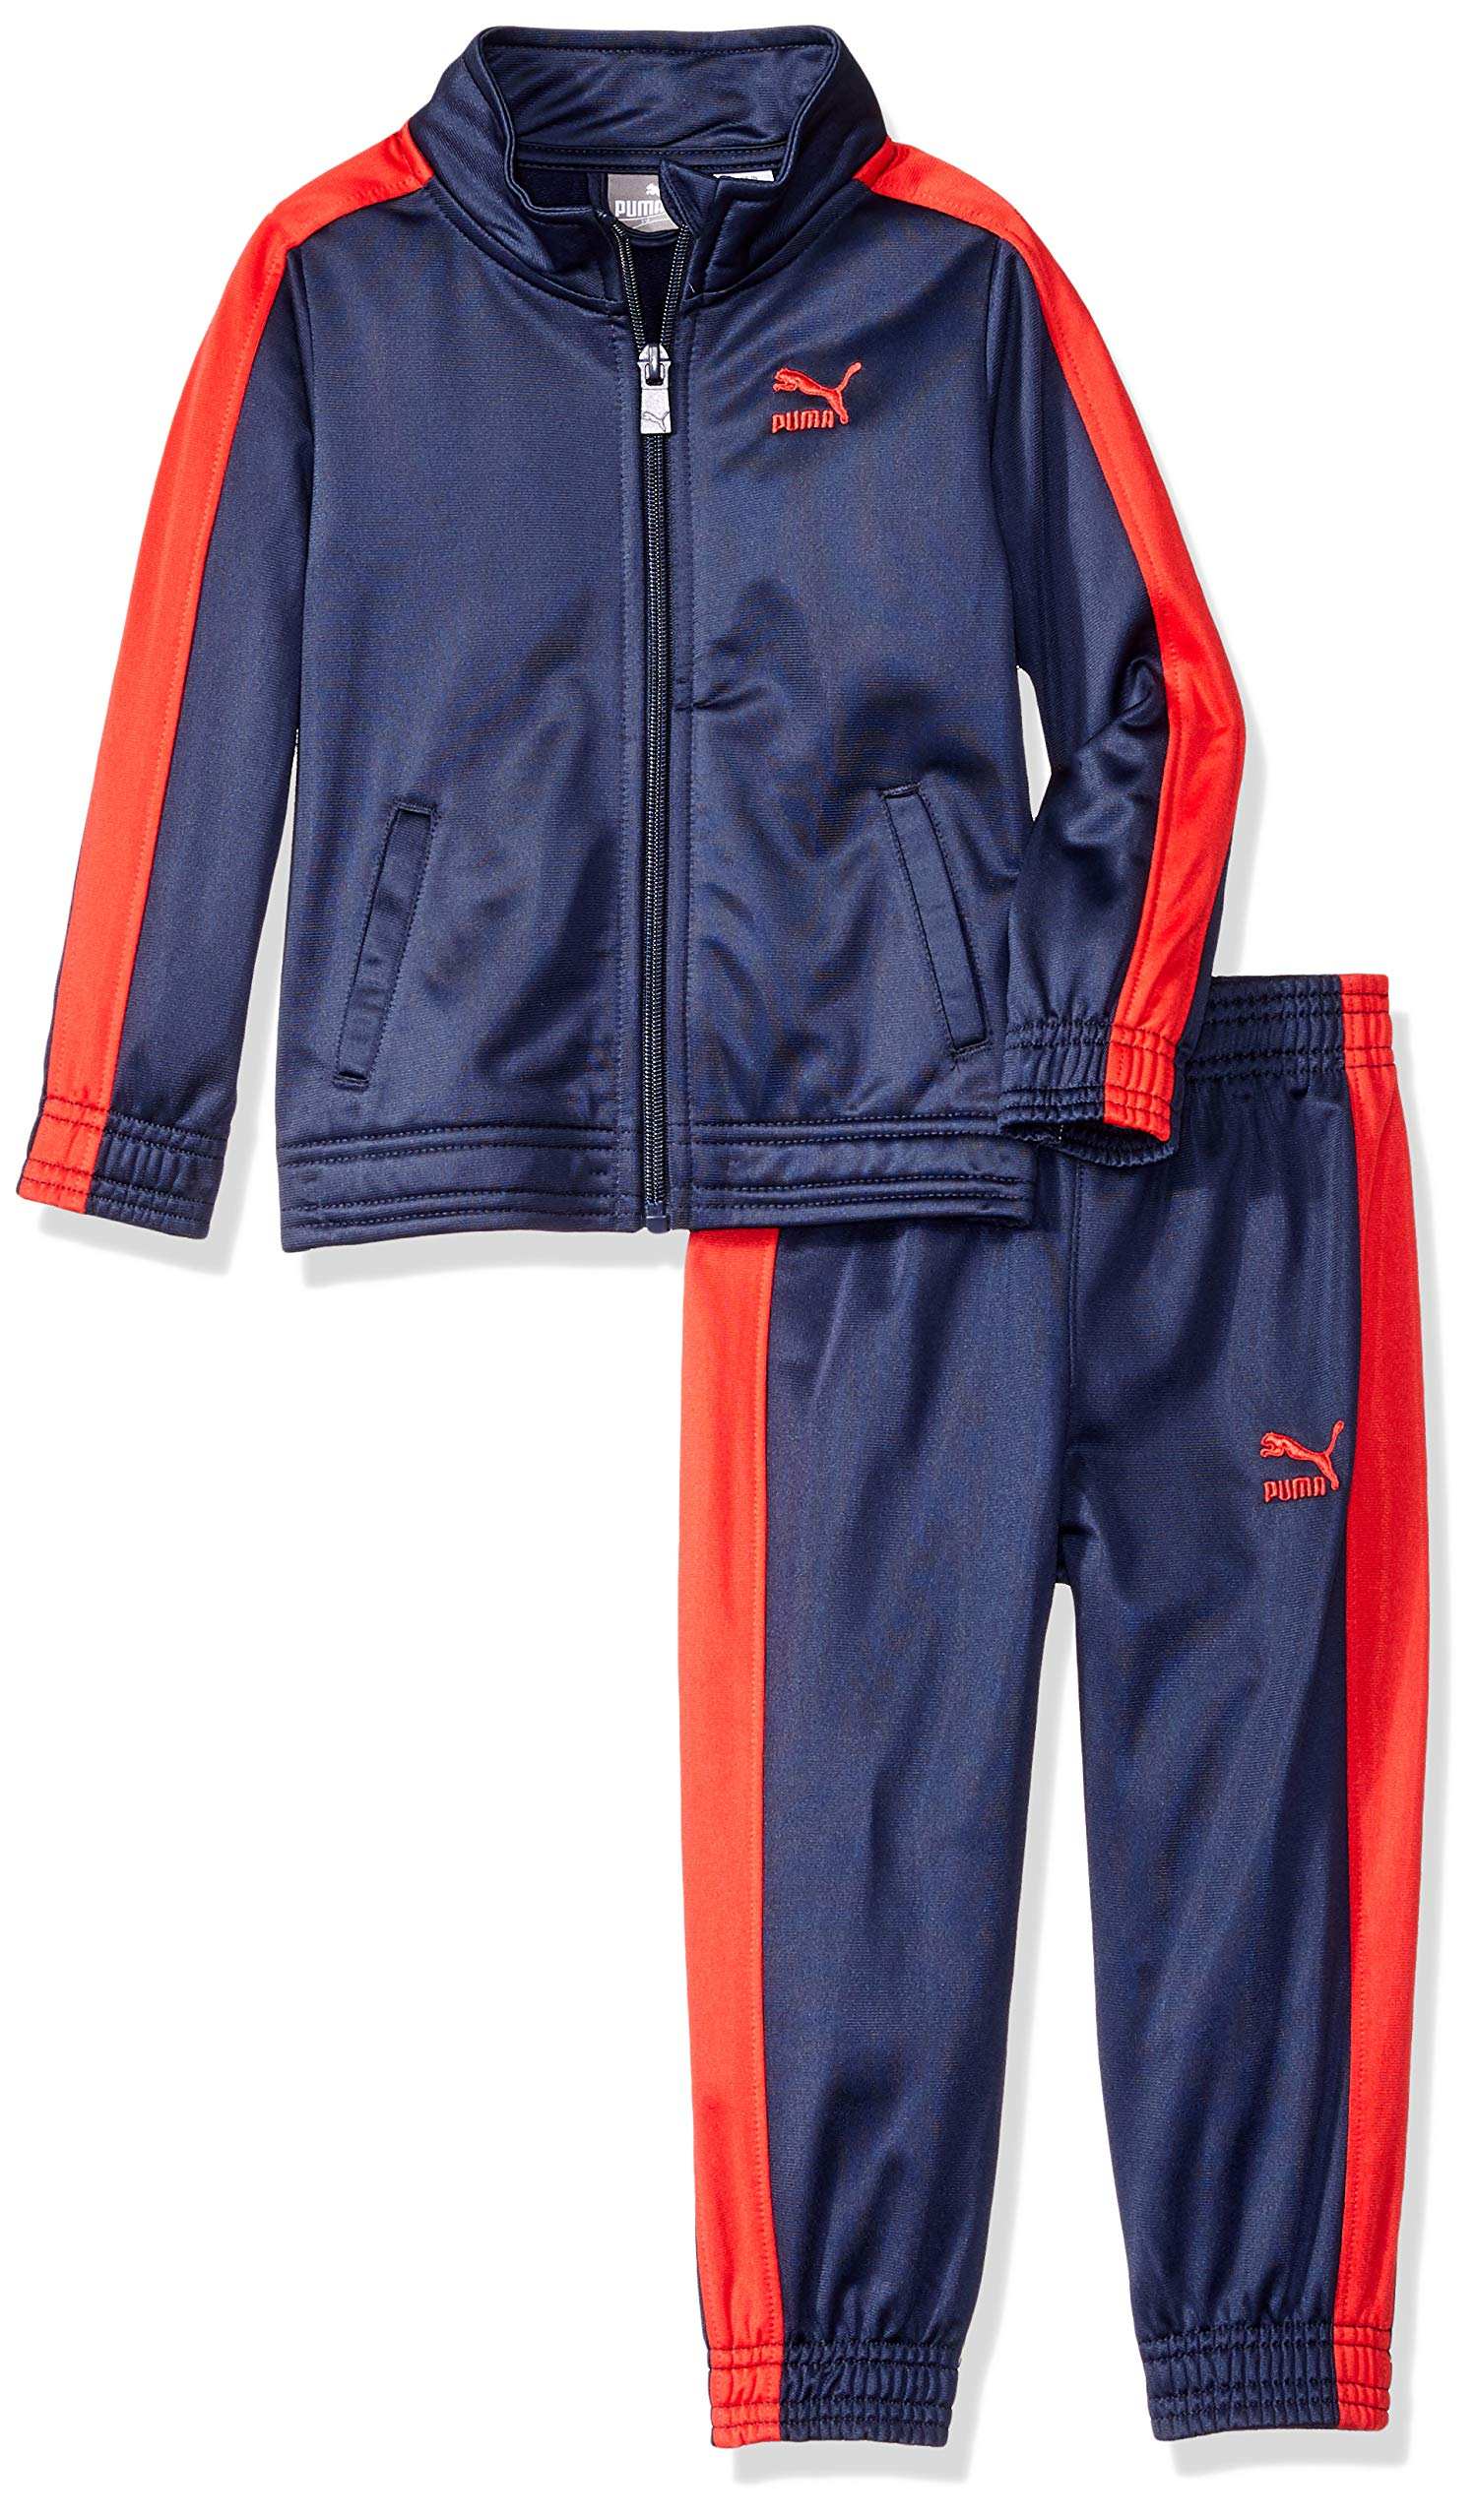 PUMA Toddler Boys' Tricot Pant Set, Peacoat, 4T